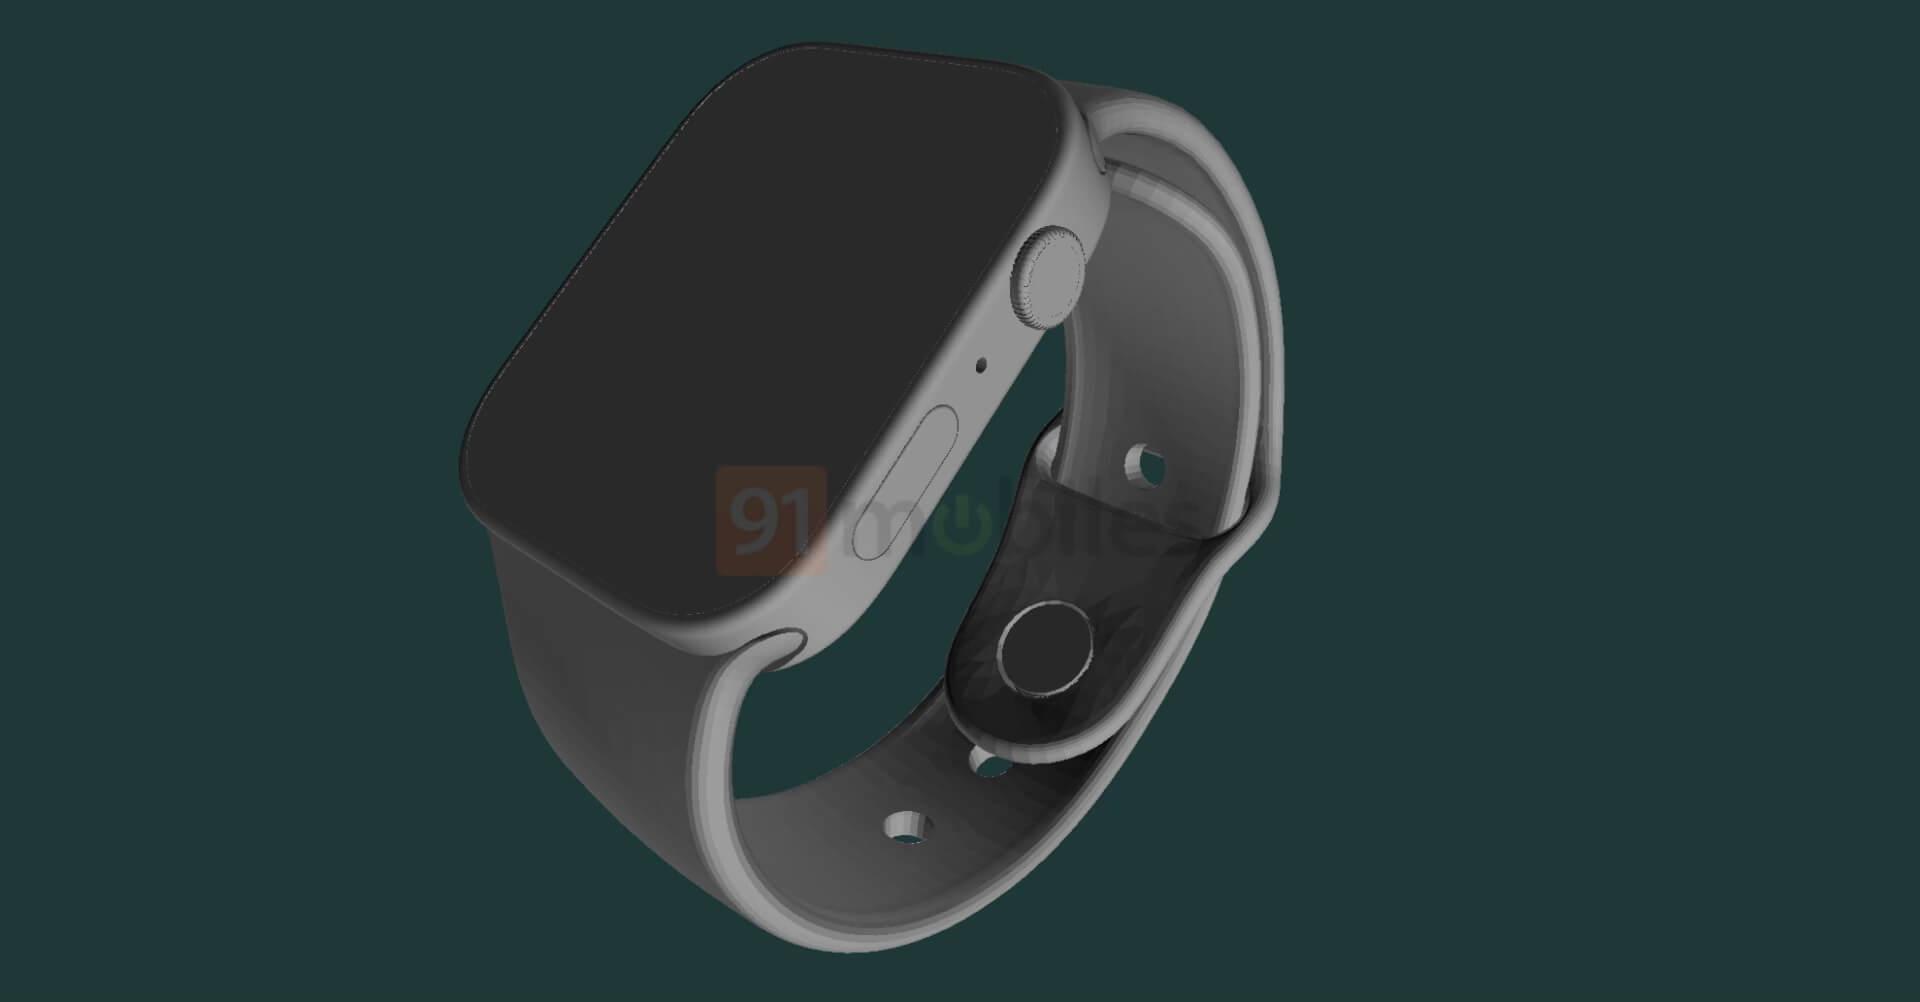 Apple Watch Series 7 Leak - 91Mobiles